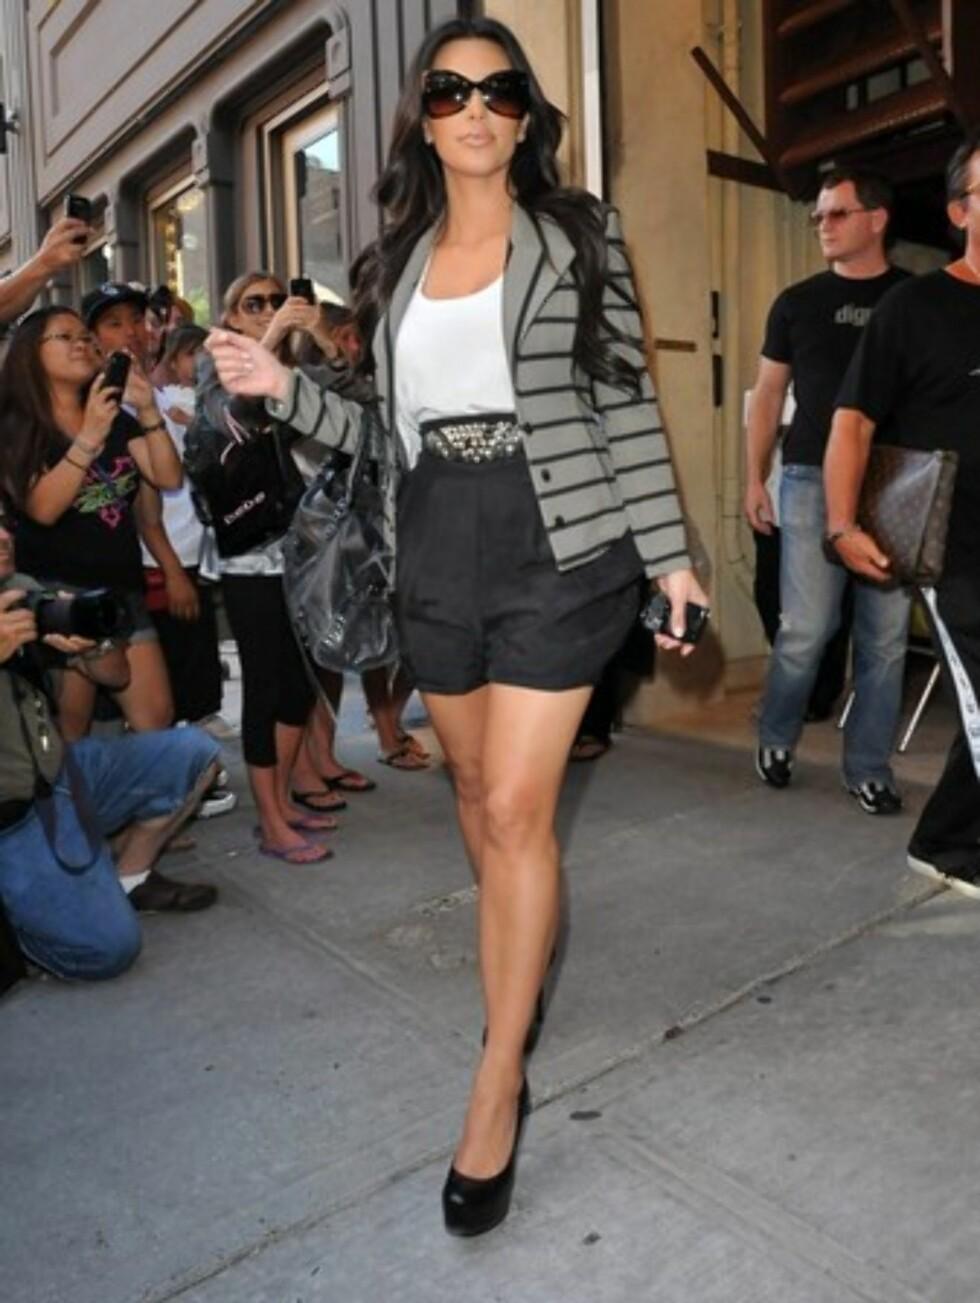 Realitykjendis Kim Kardashian. Foto: All Over Press